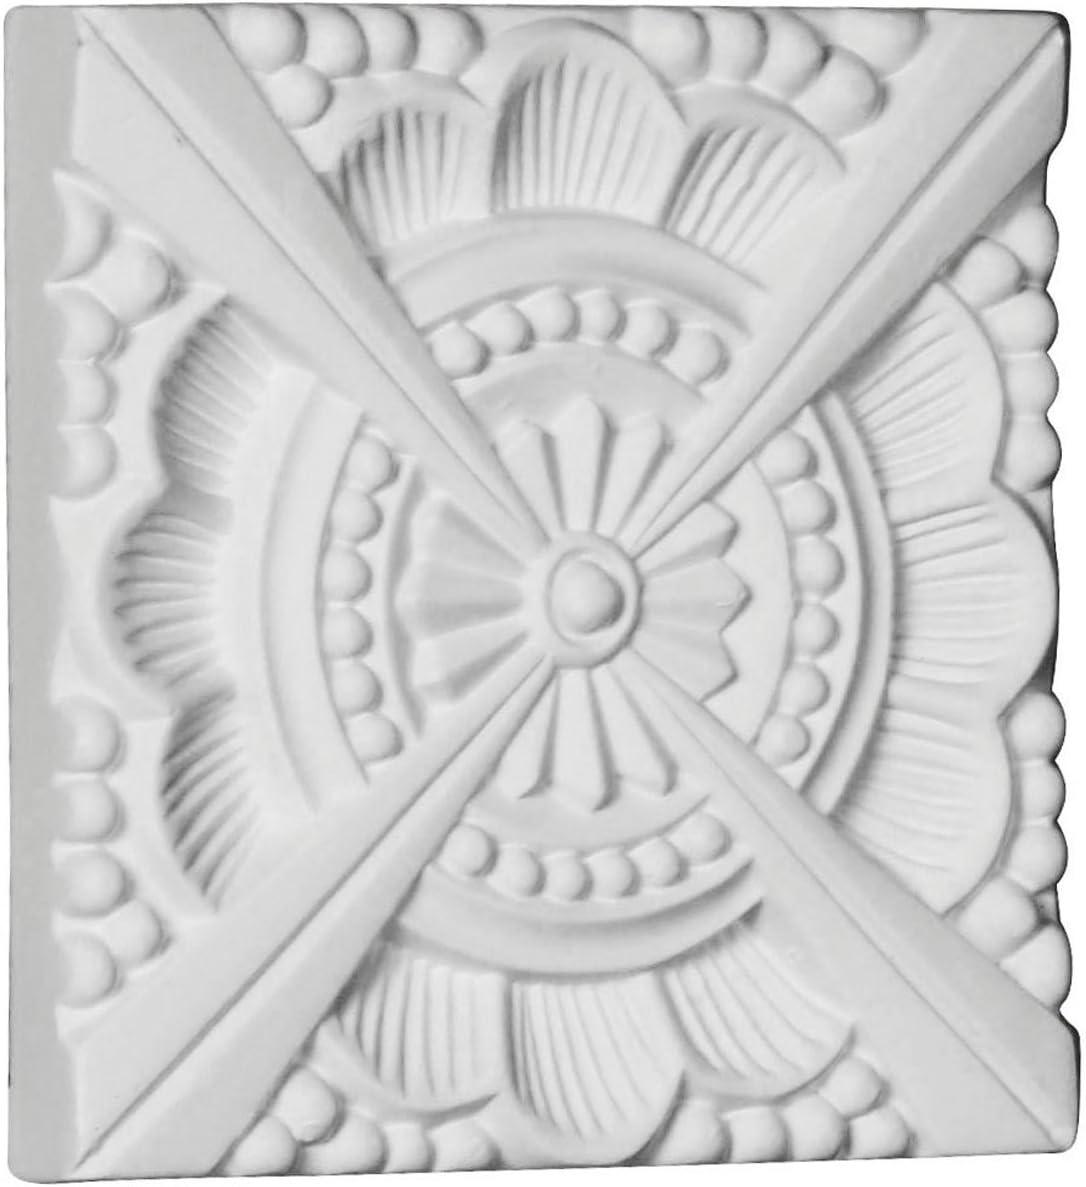 Ceiling Medallions Ekena Millwork ROS05X05PM W x 4 3/4 H x 5/8 P ...